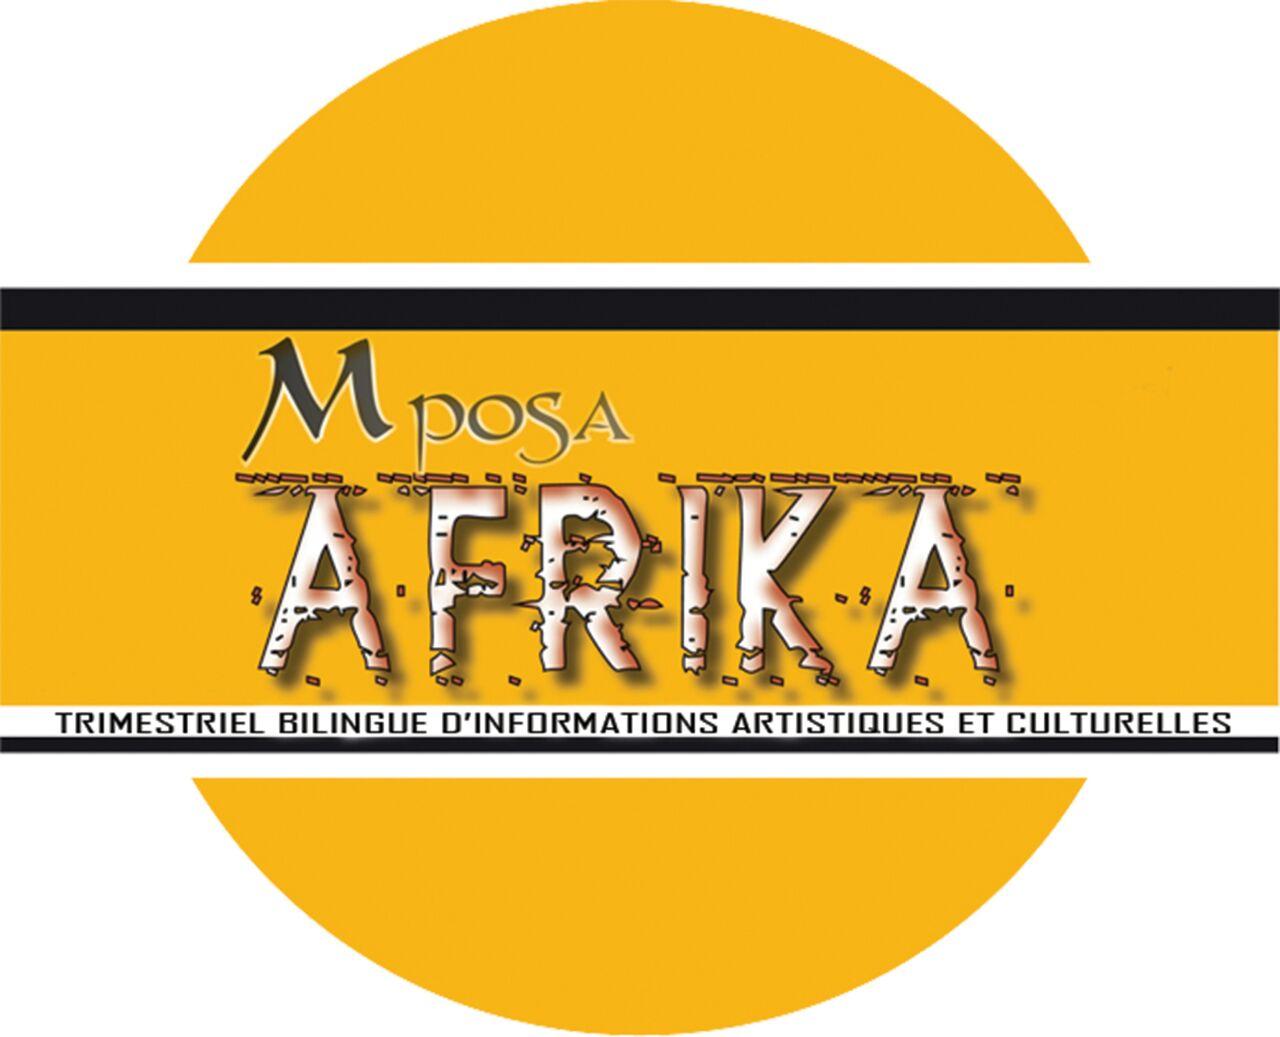 Mposa Afrika